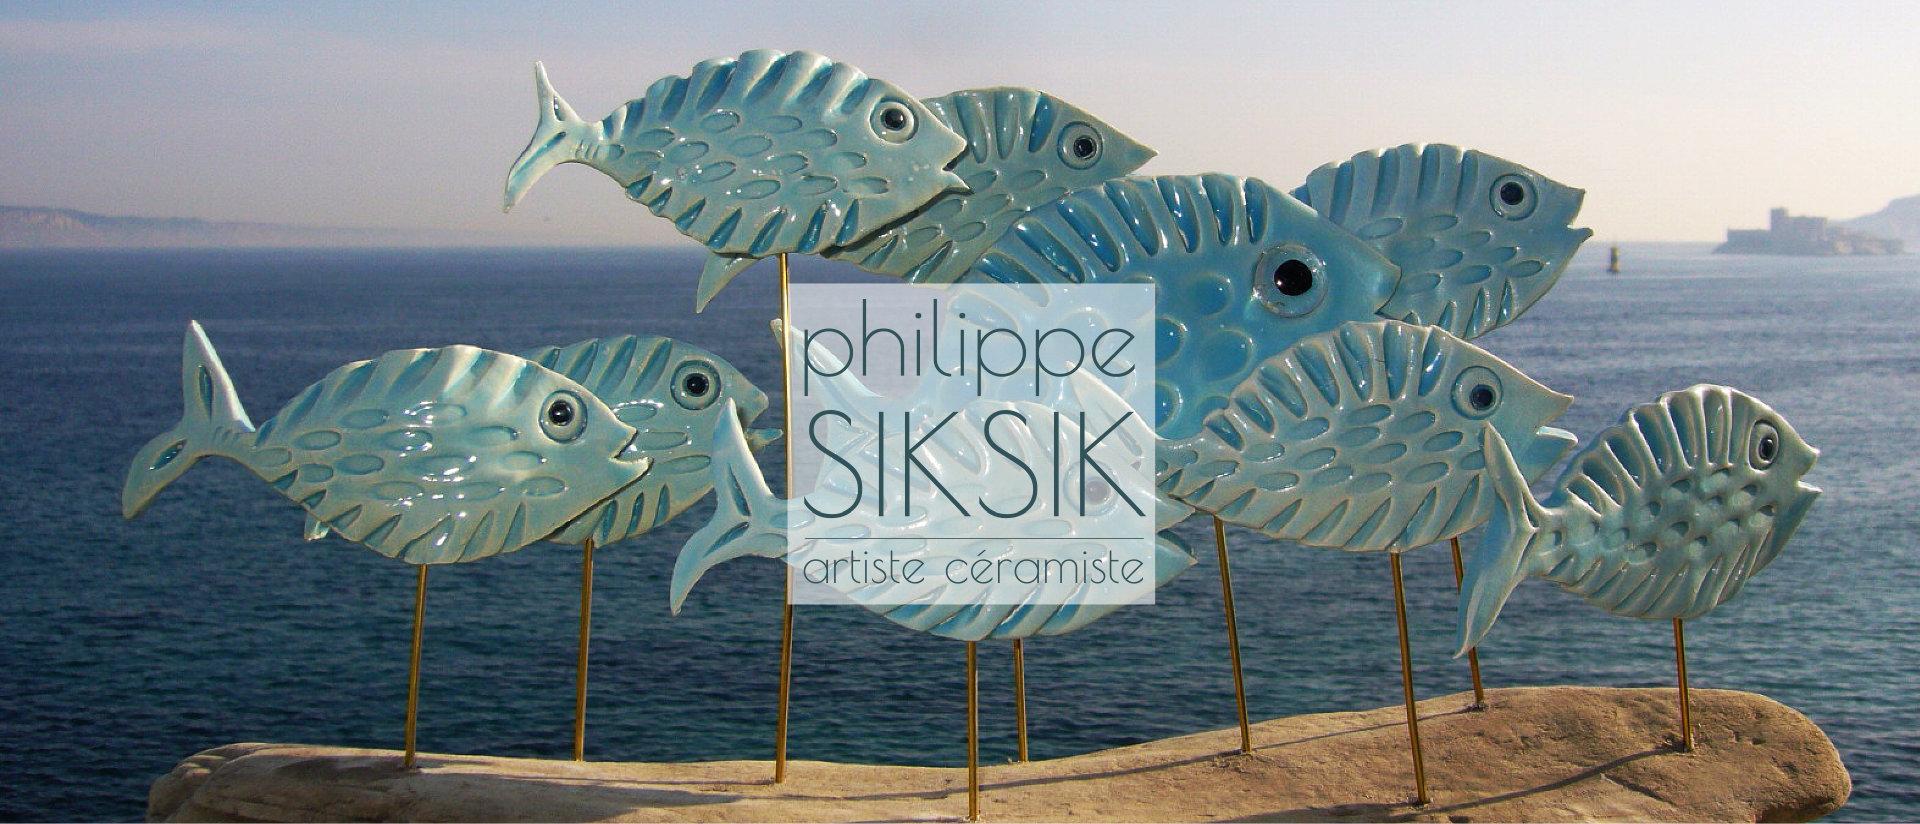 Philippe Siksik artiste ceramiste